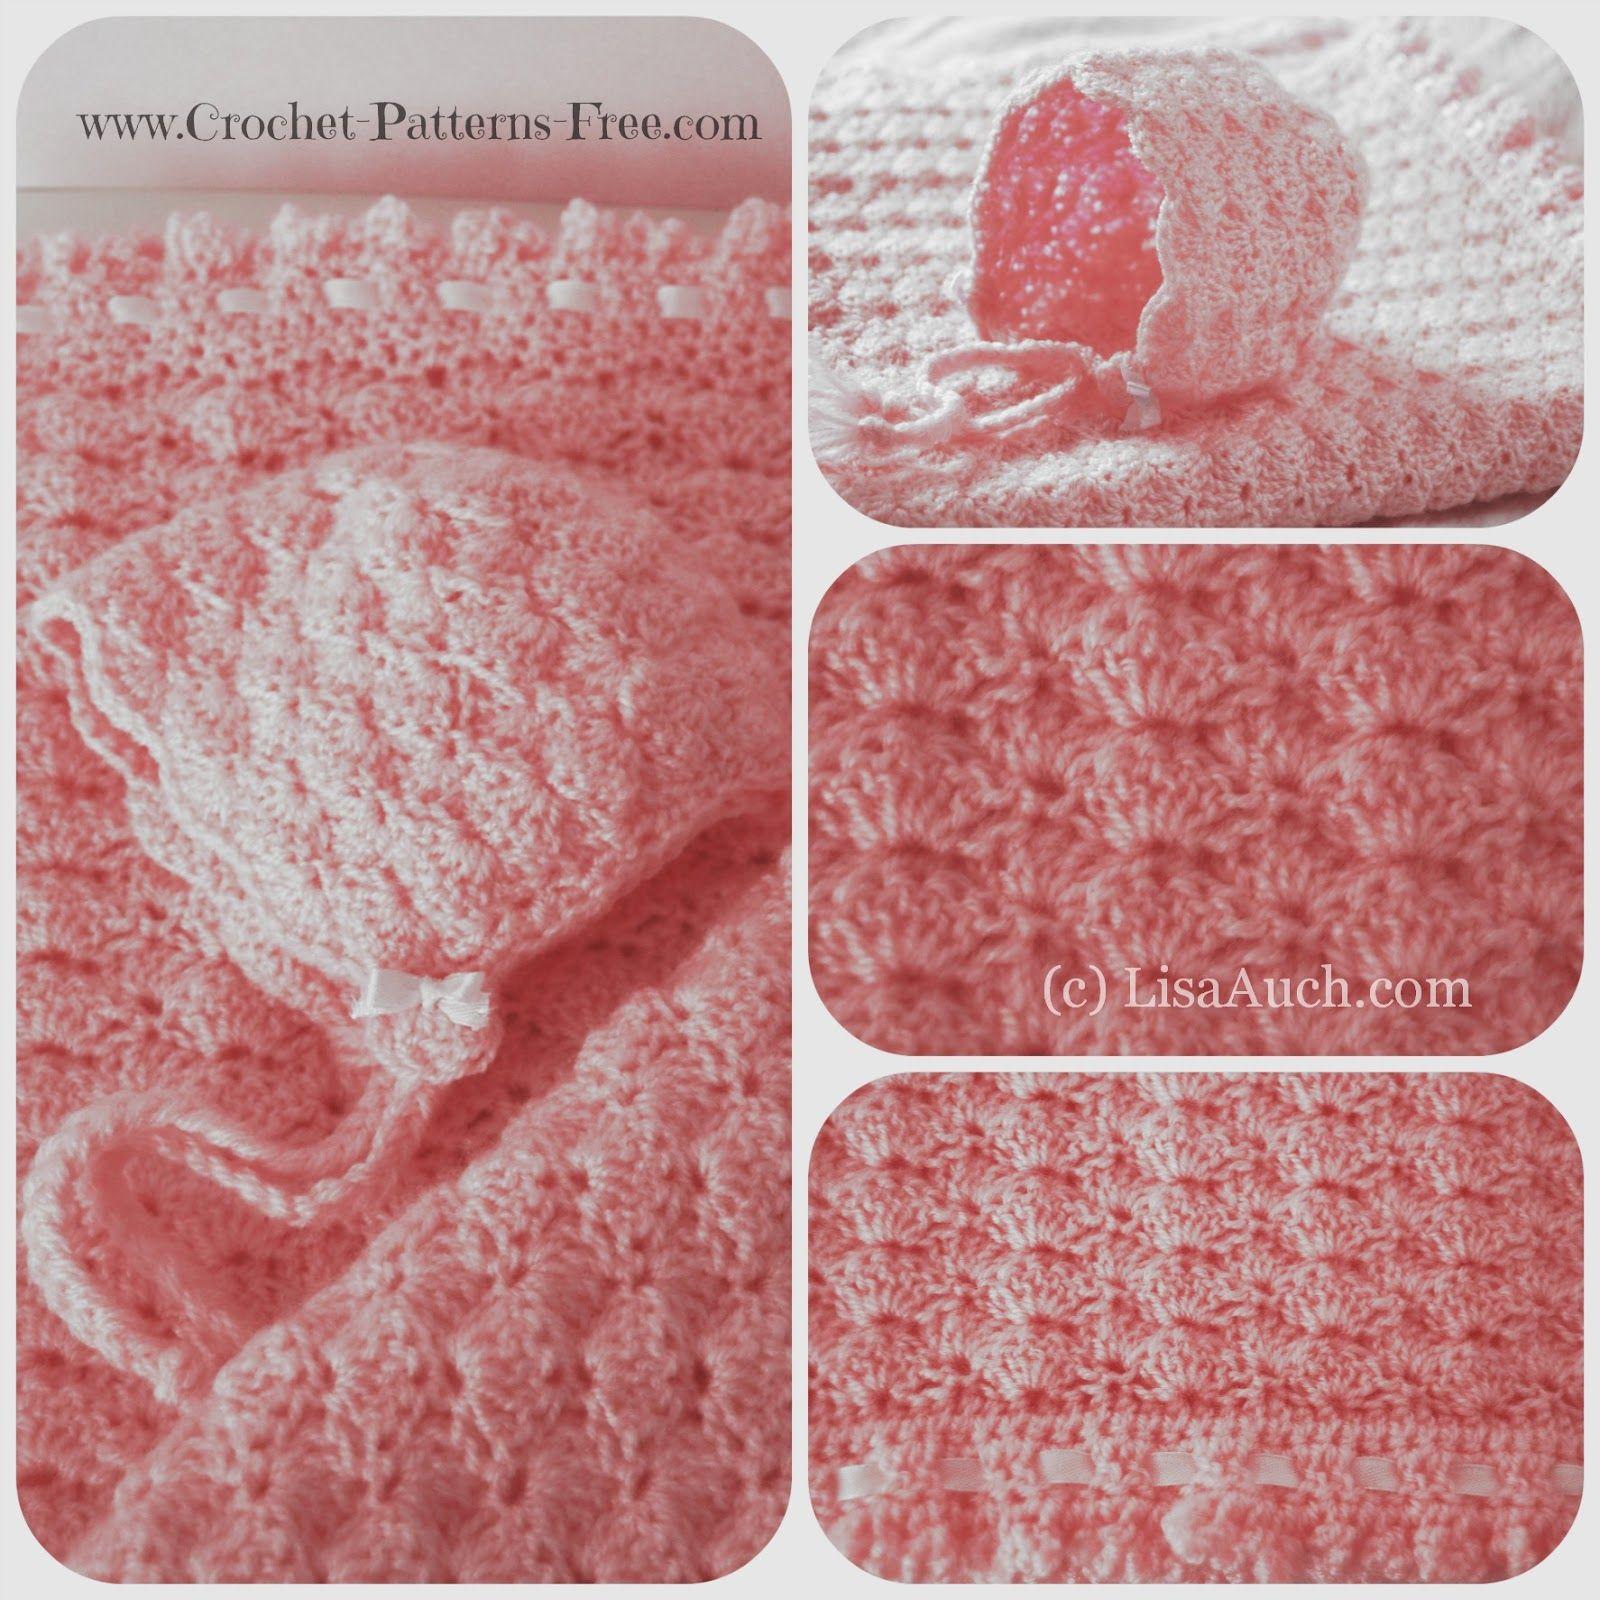 Free crochet baby blanket pattern in shell stitch baby bonnet free crochet baby blanket pattern in shell stitch dt1010fo